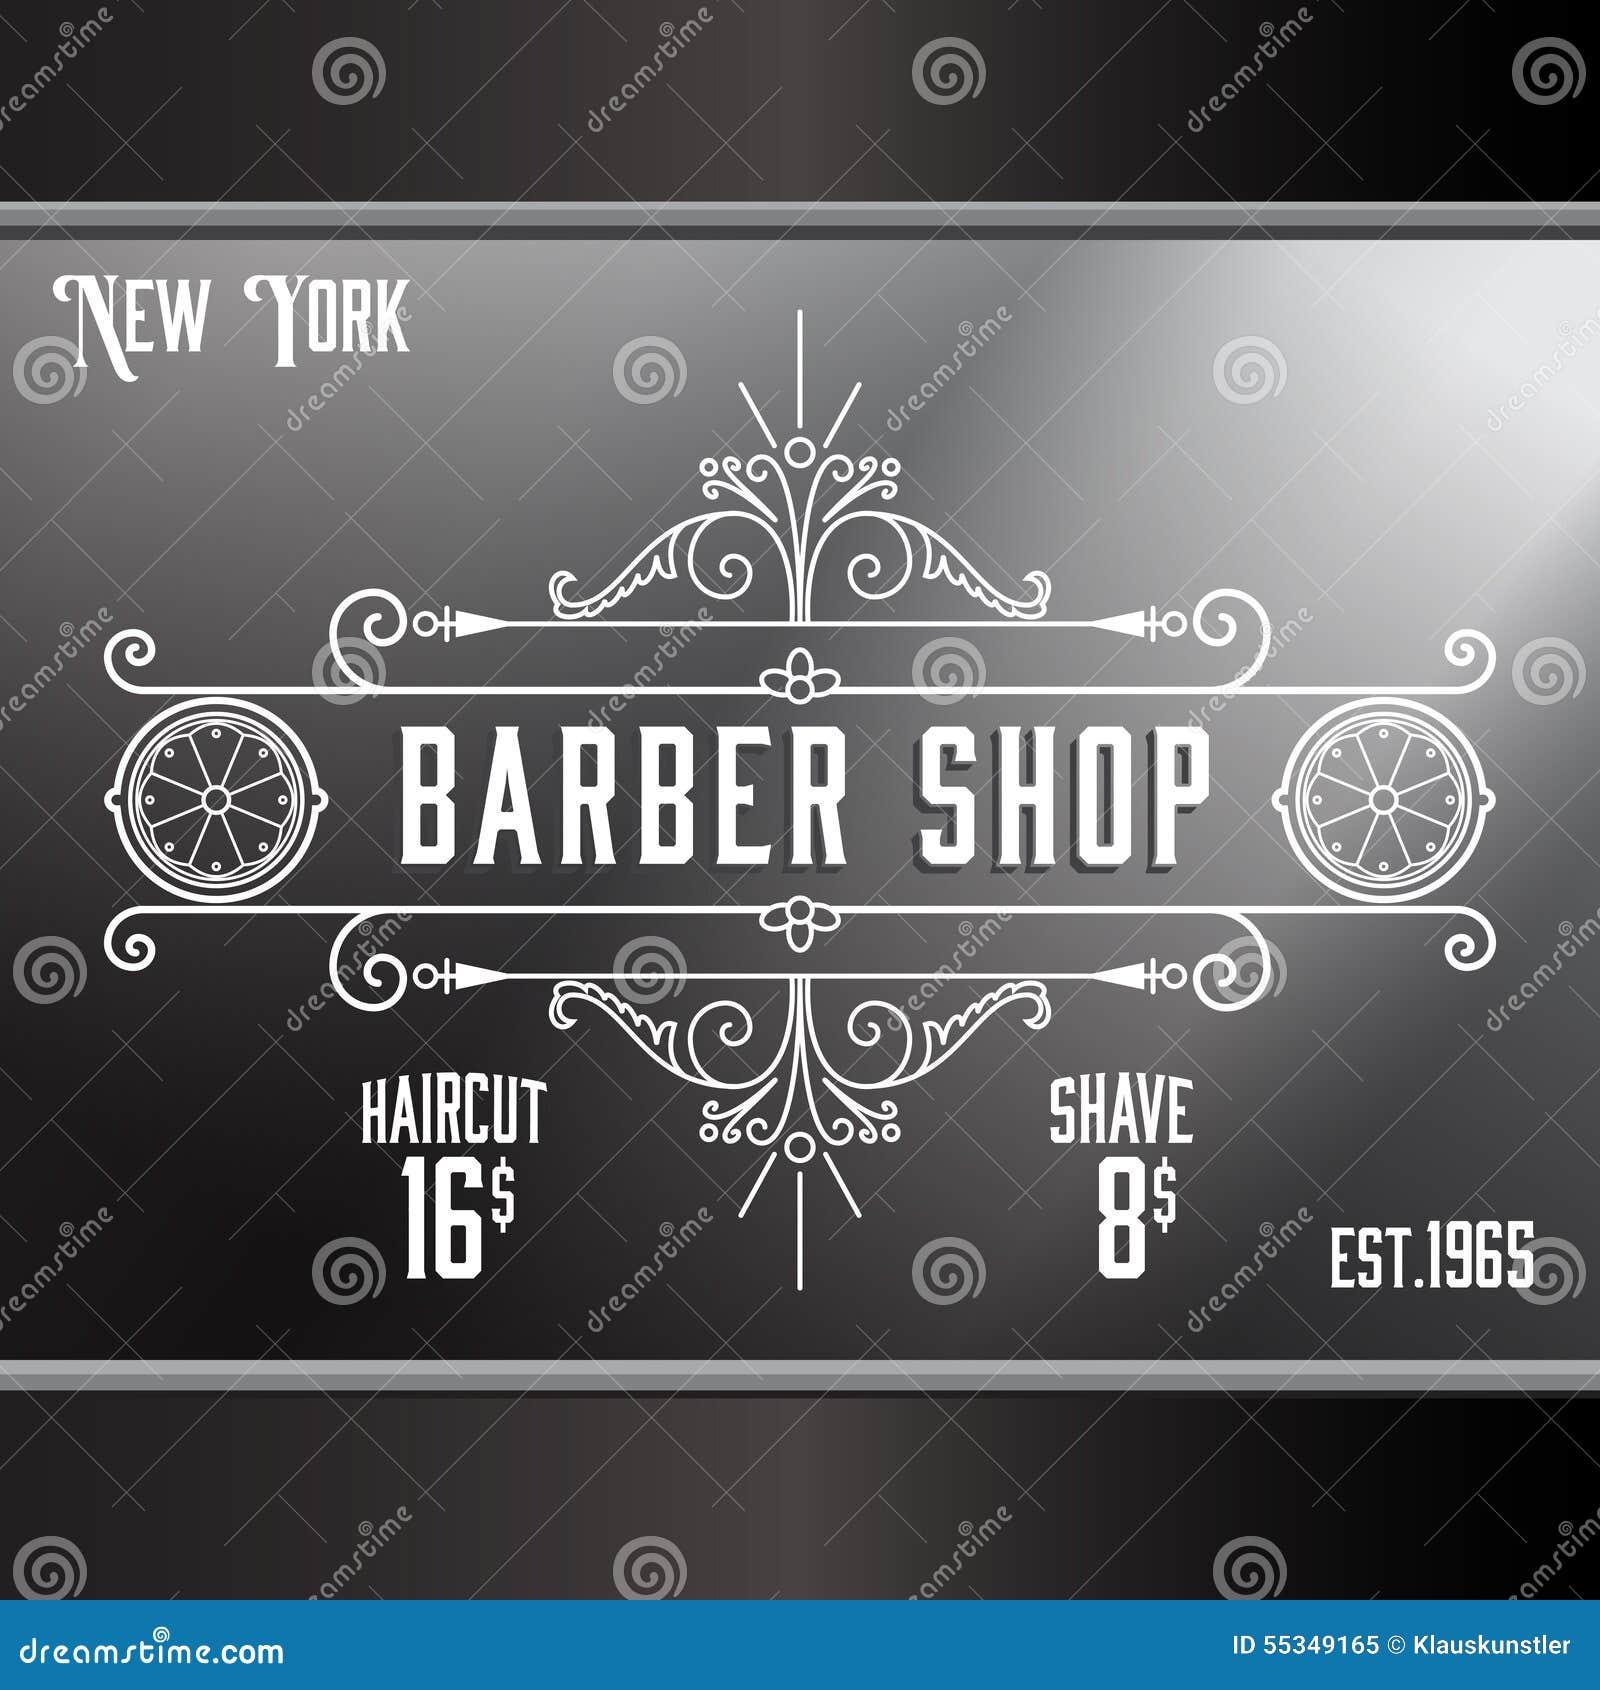 Old barber shop window - Vintage Barber Shop Window Advertising Template Stock Vector